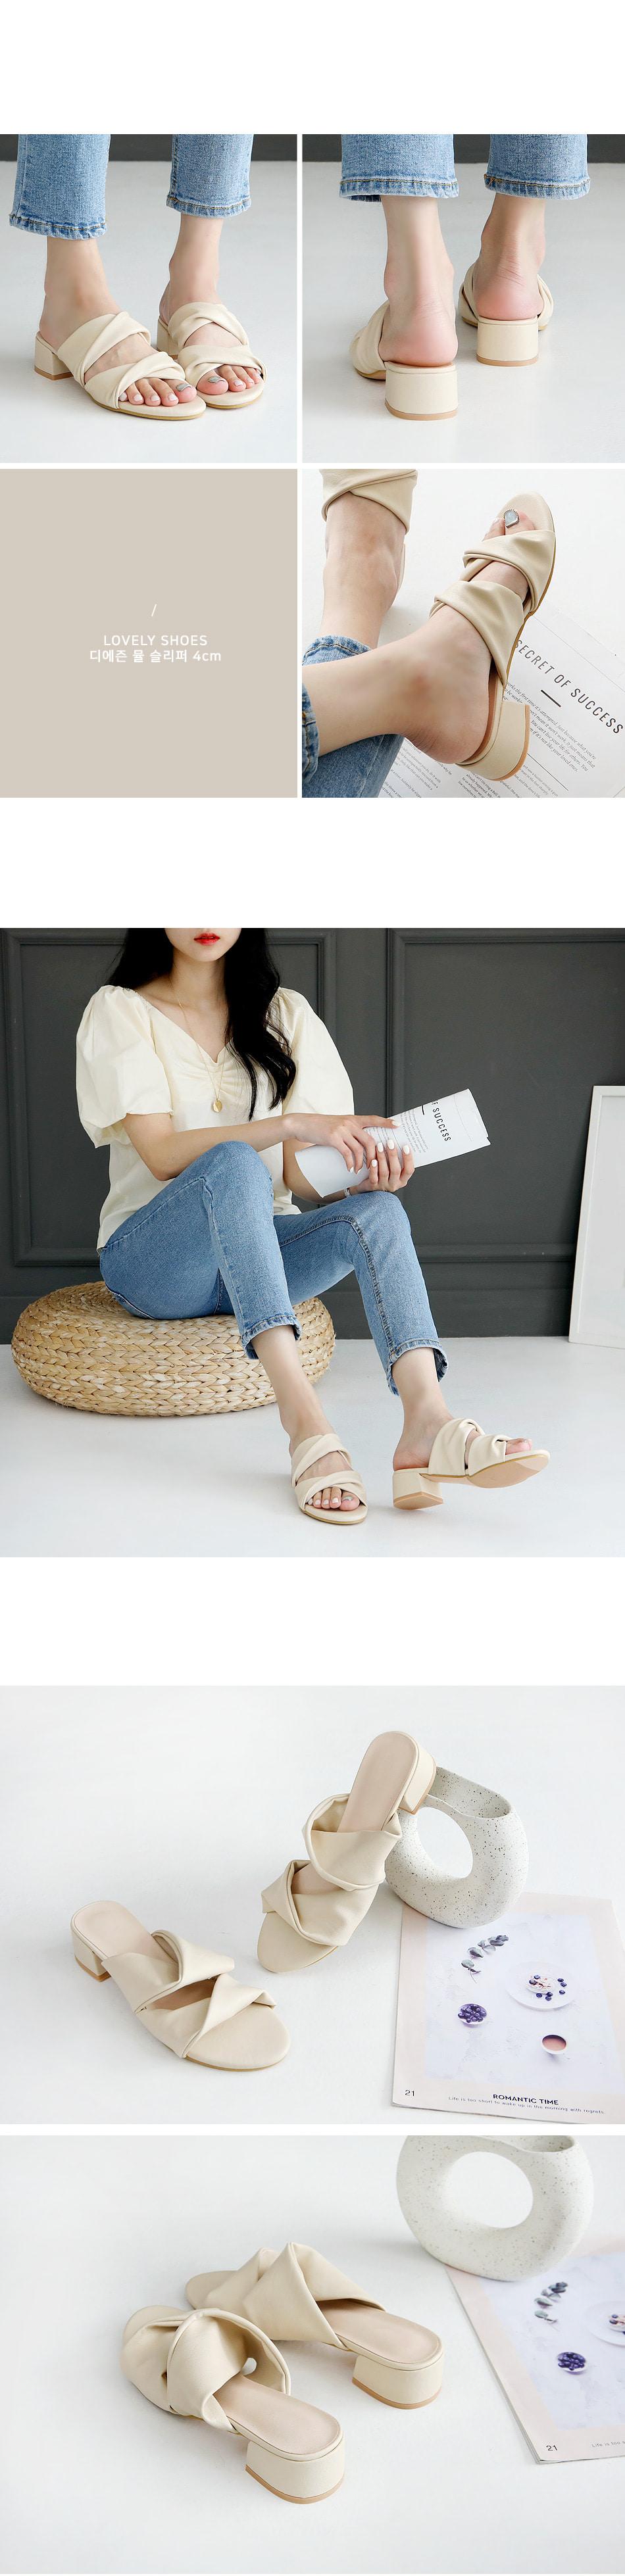 Dijon Mule Slippers 4cm